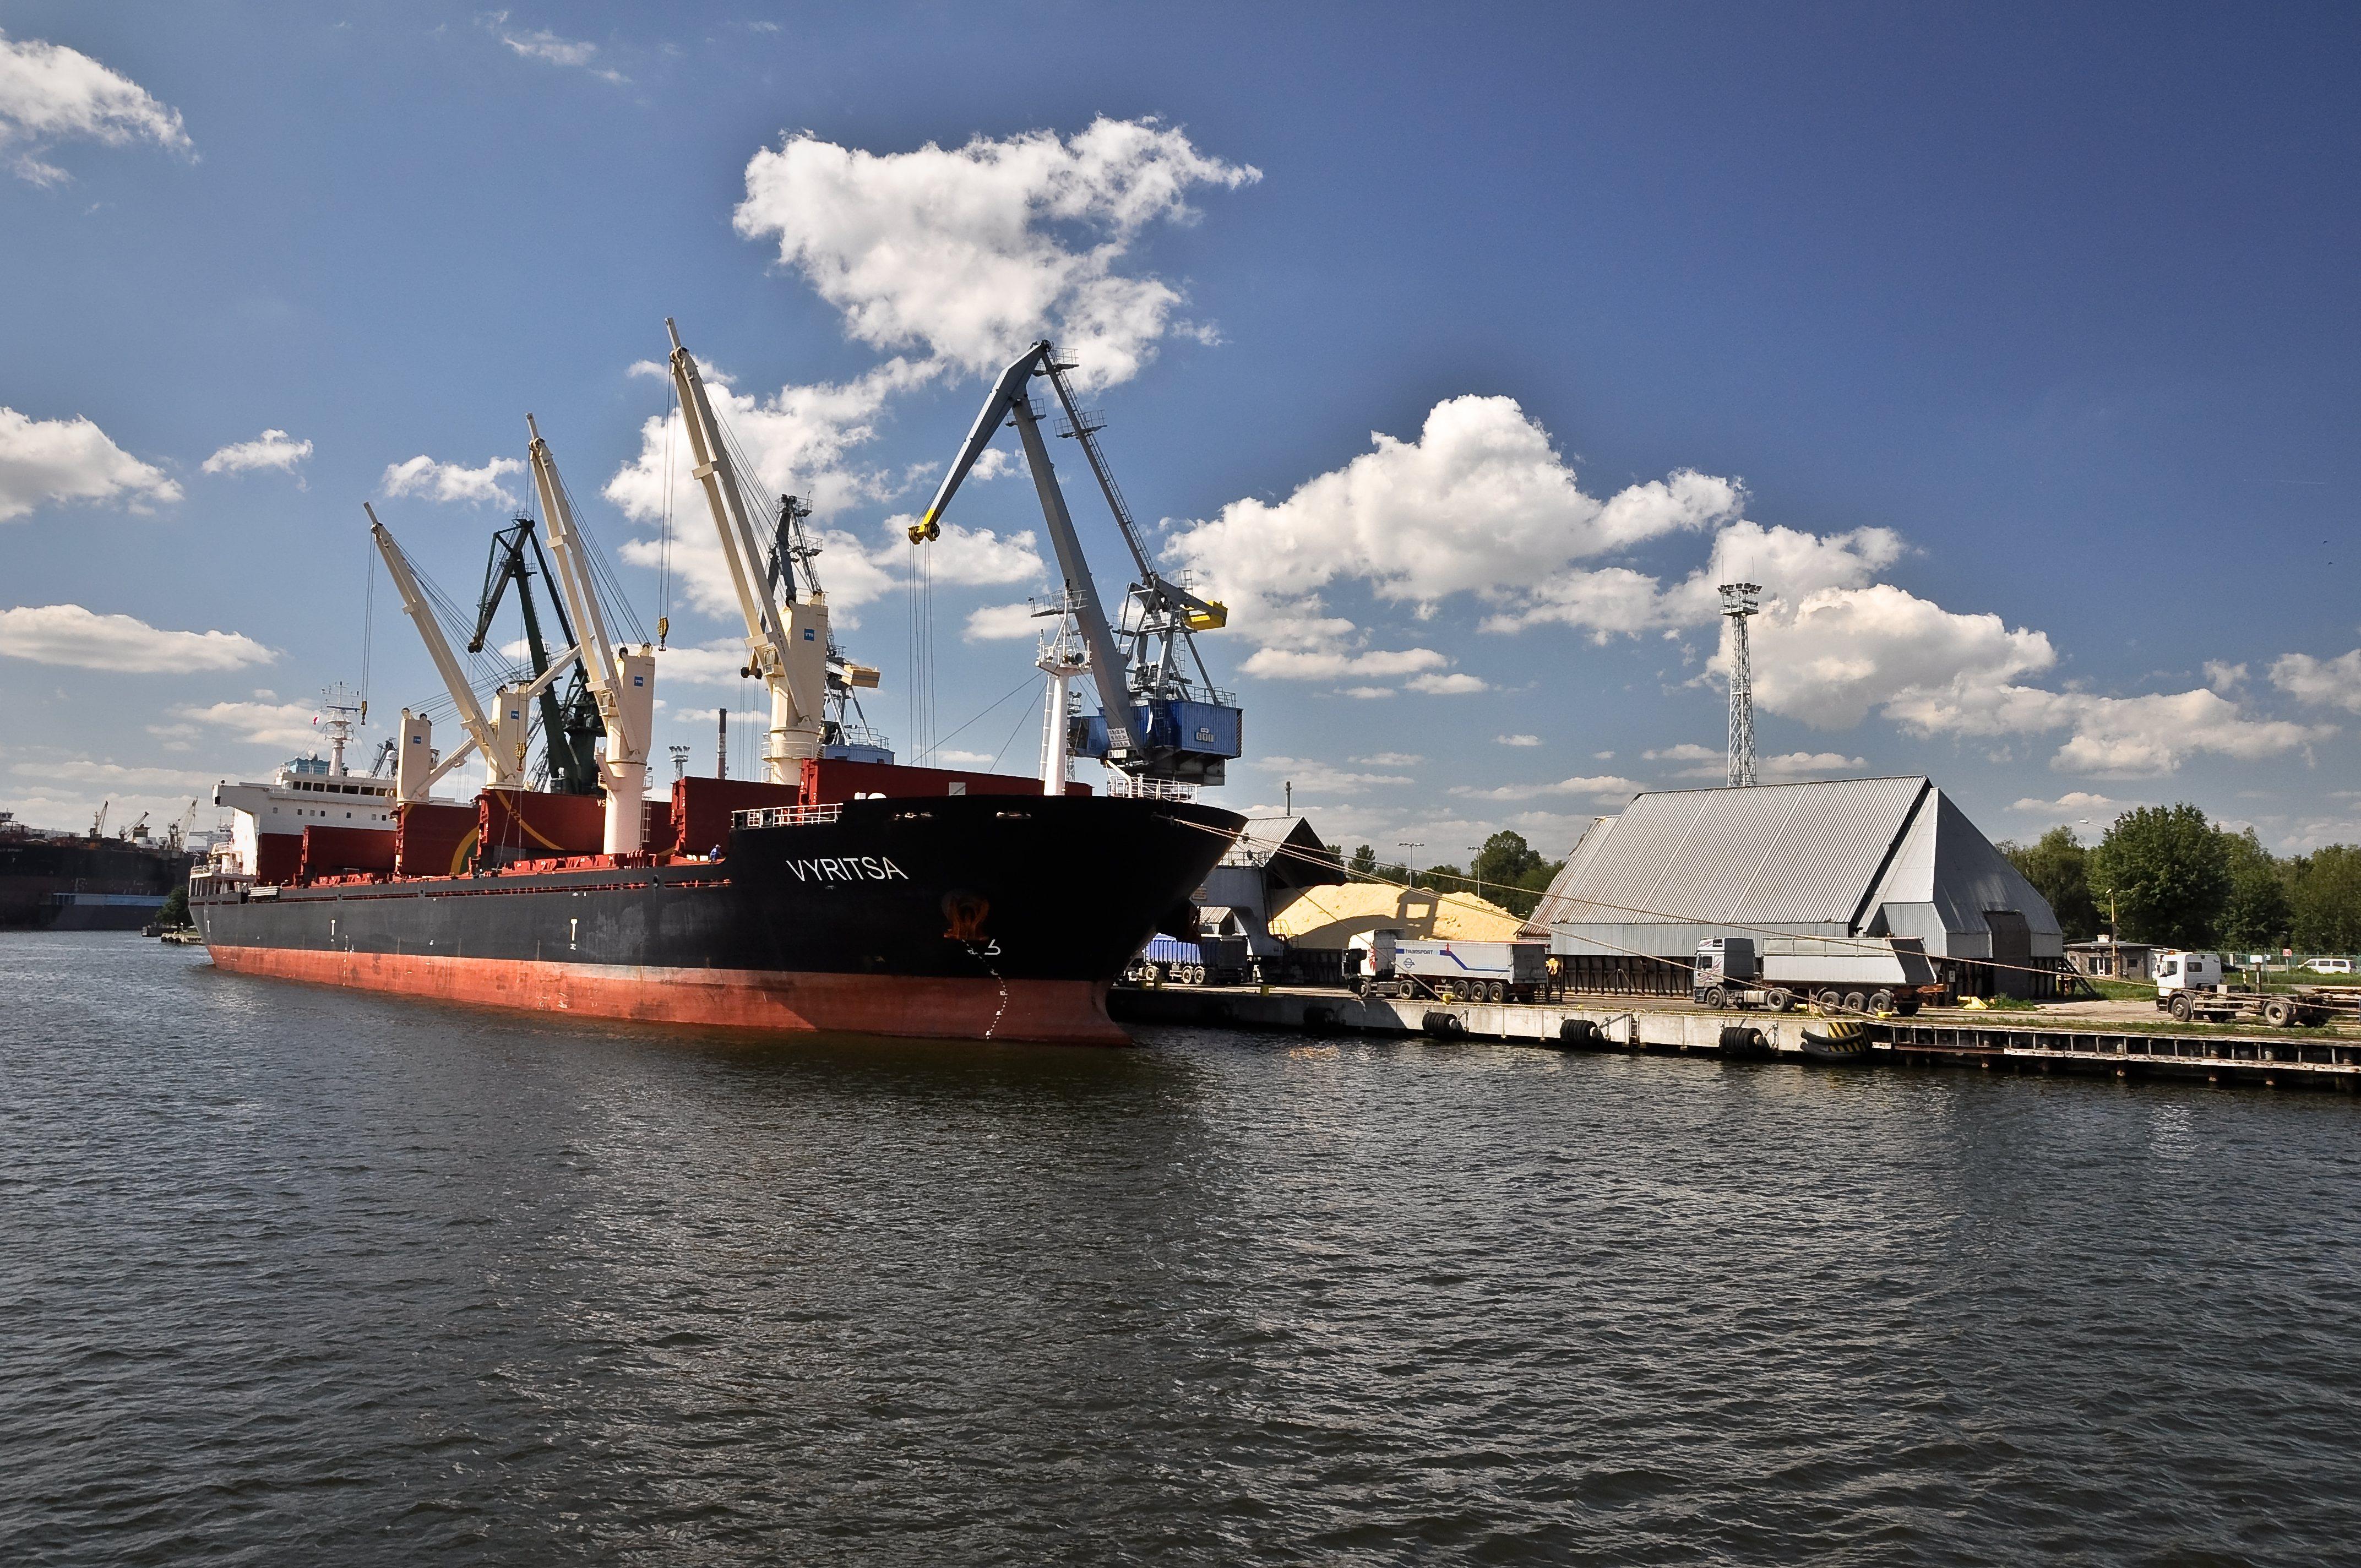 Vyritsa cargo Ship, Gdansk, Poland, Baltic, Poland, Water, Vessels, HQ Photo